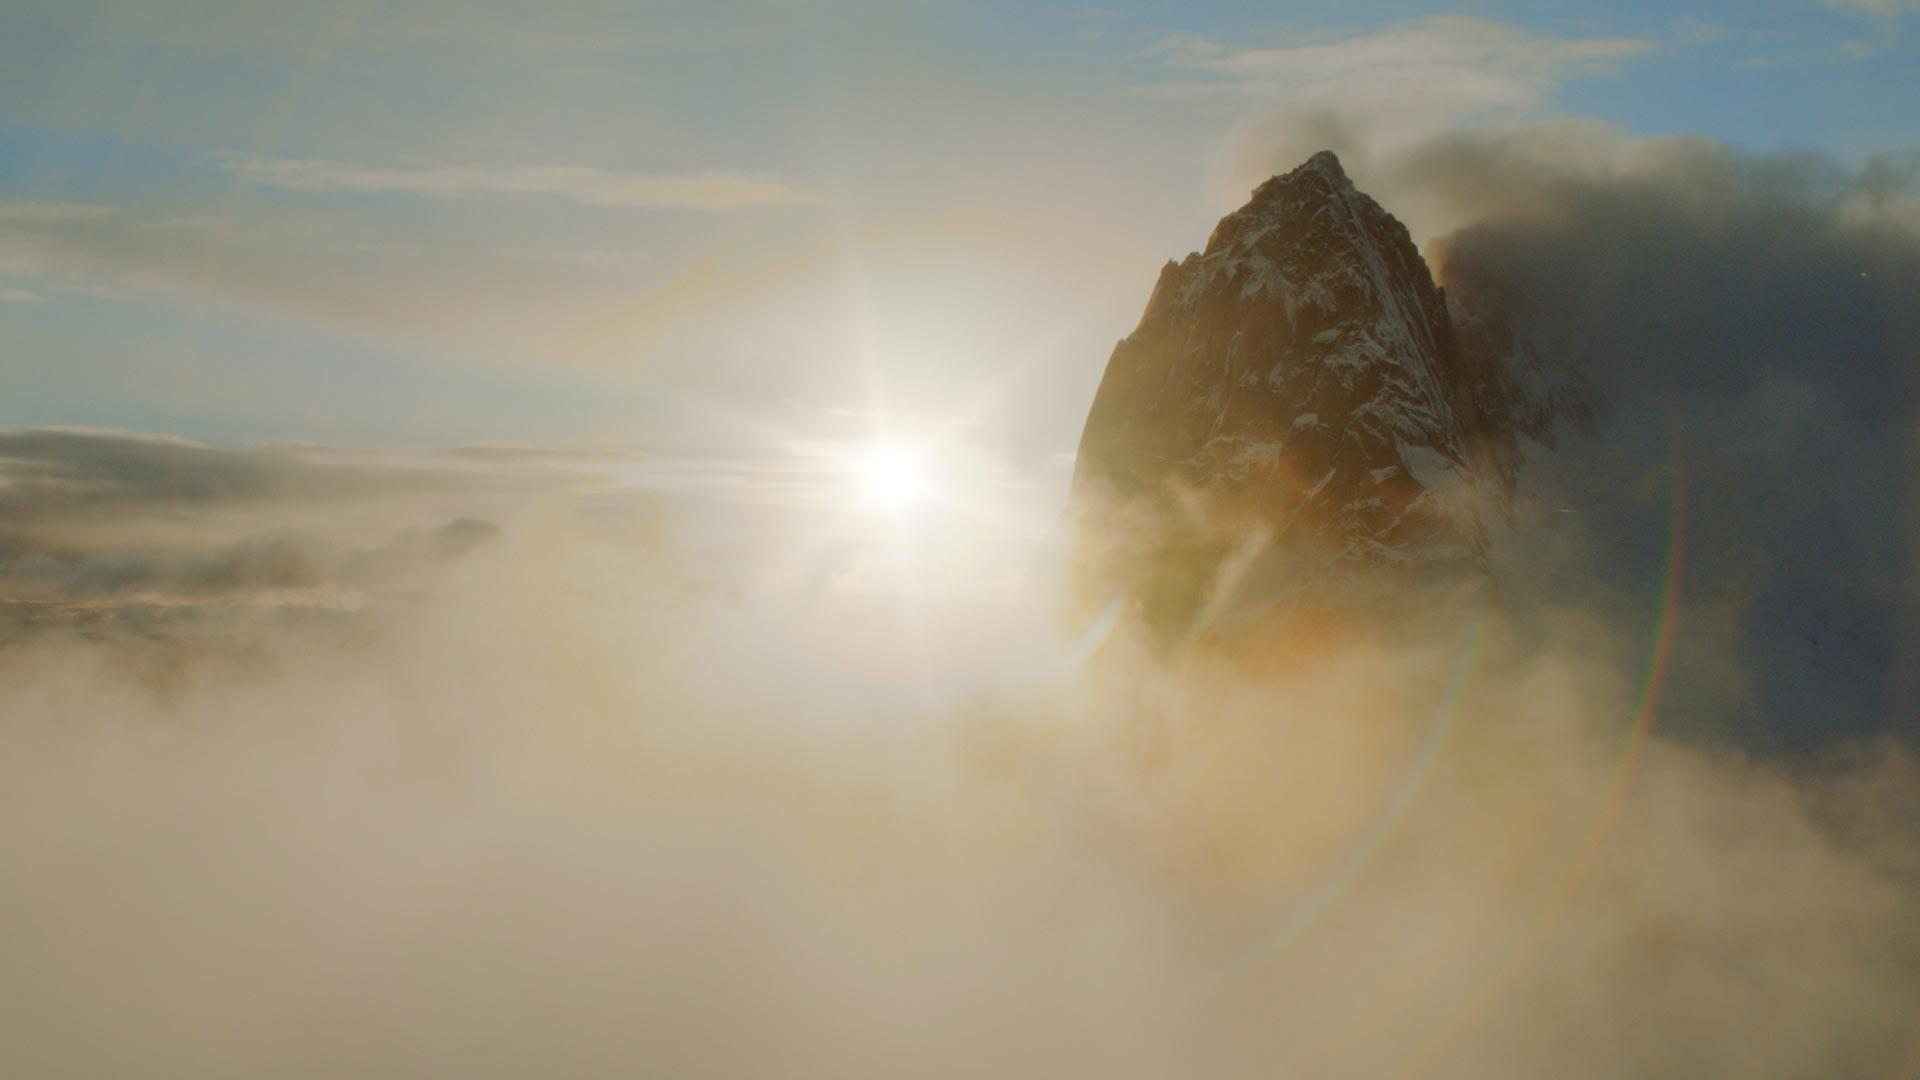 Kingdoms of the Sky |Trailer